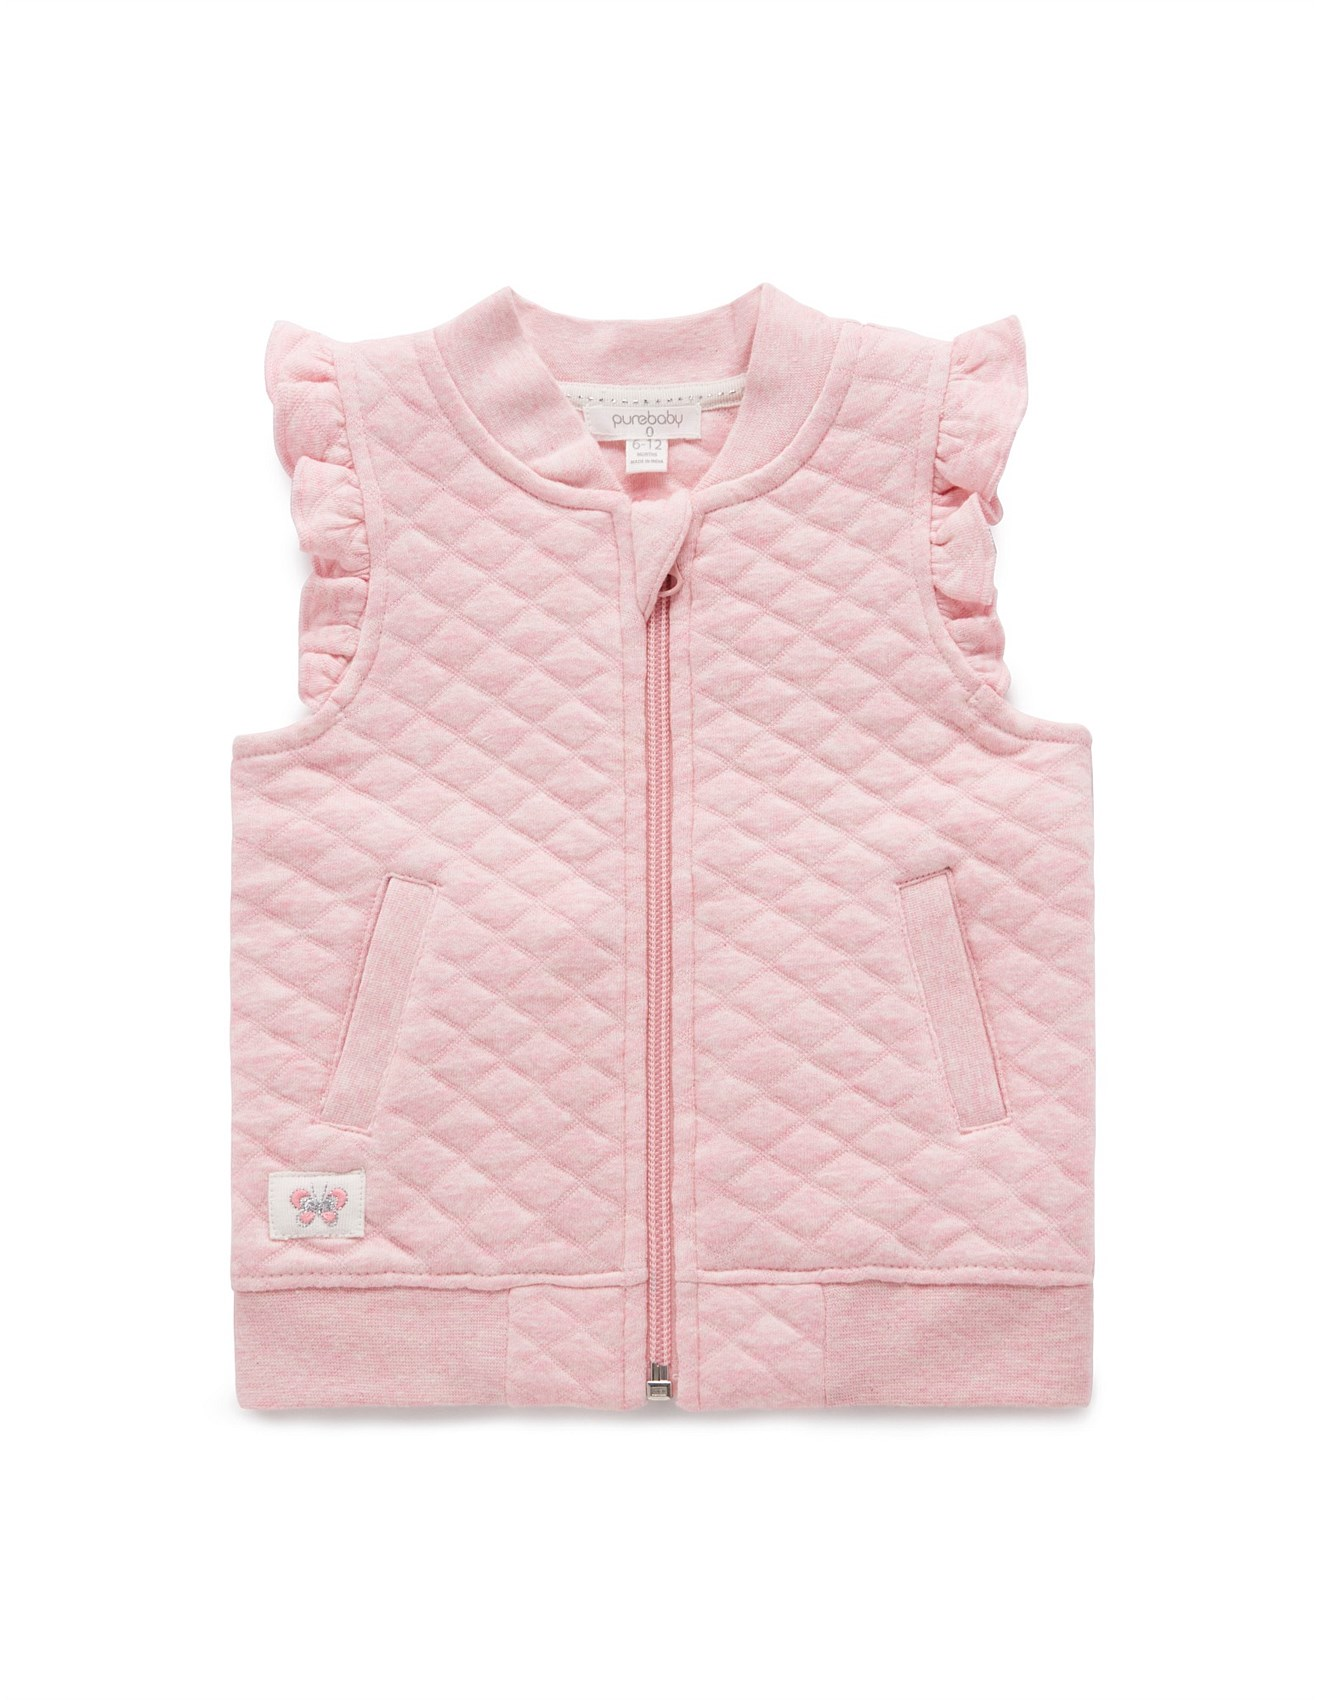 b79a0651c233 Baby Clothing